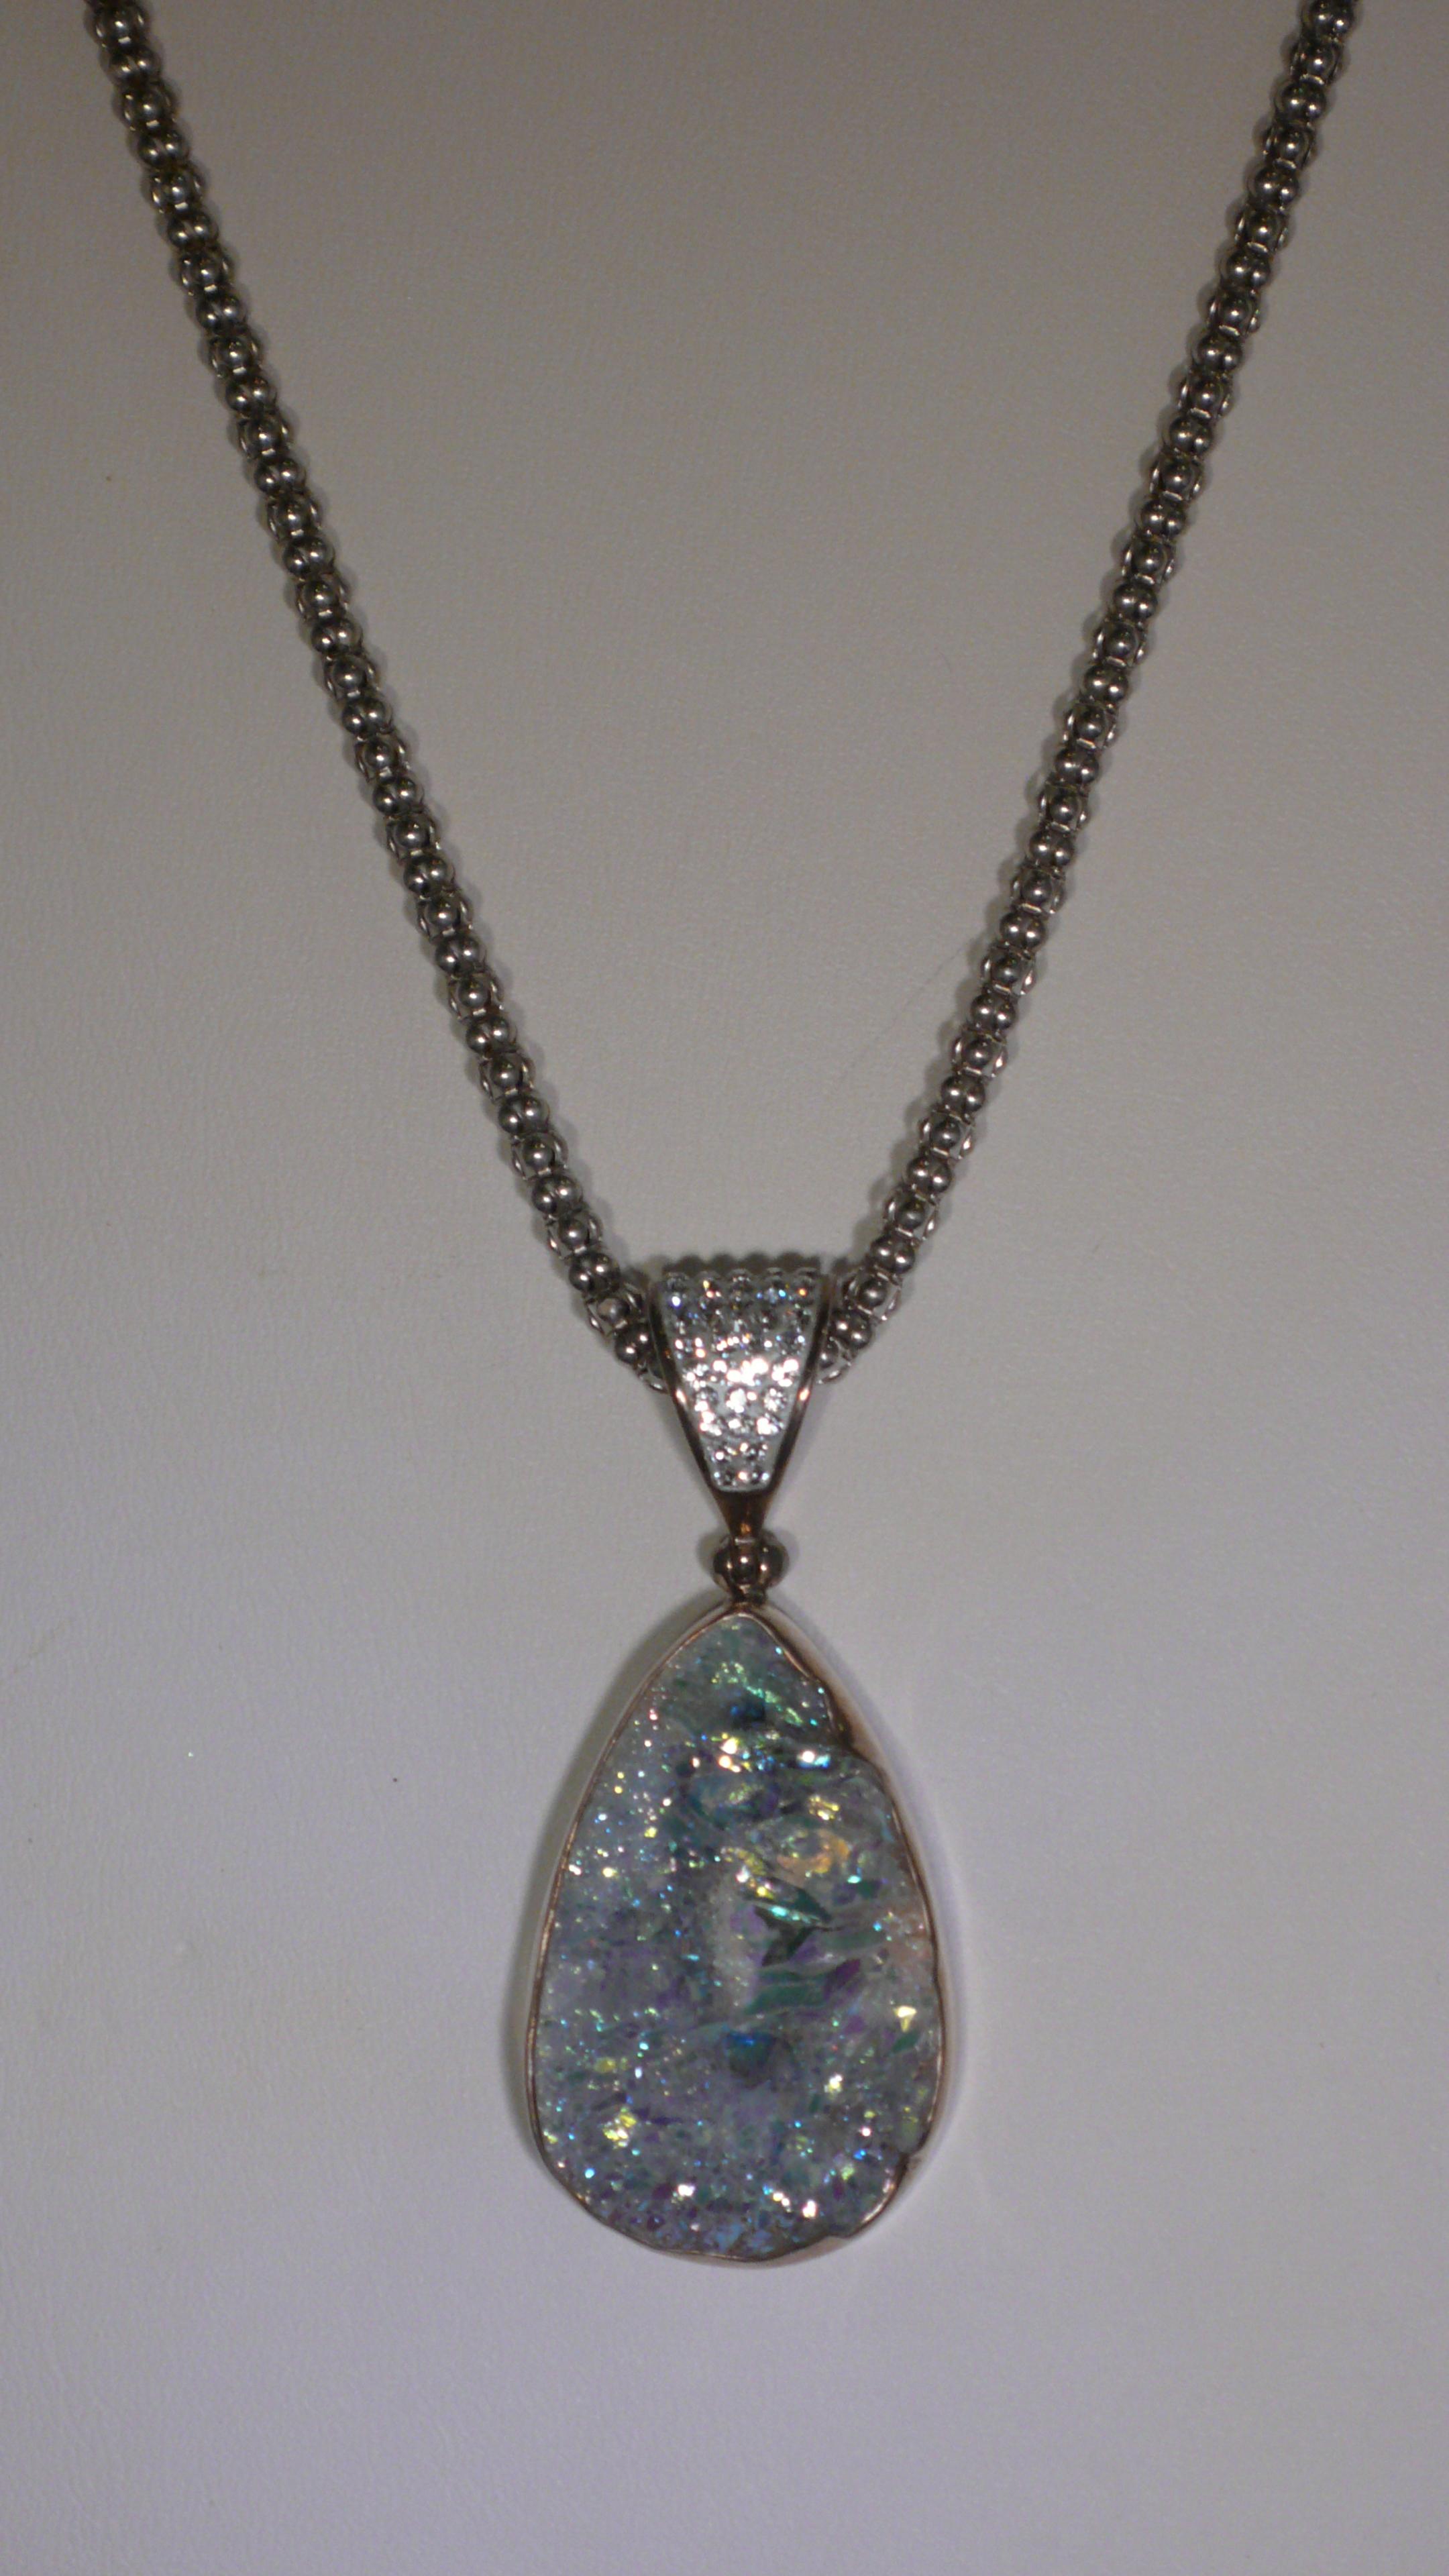 Mitzi's Fine Jewelry - ECayOnline